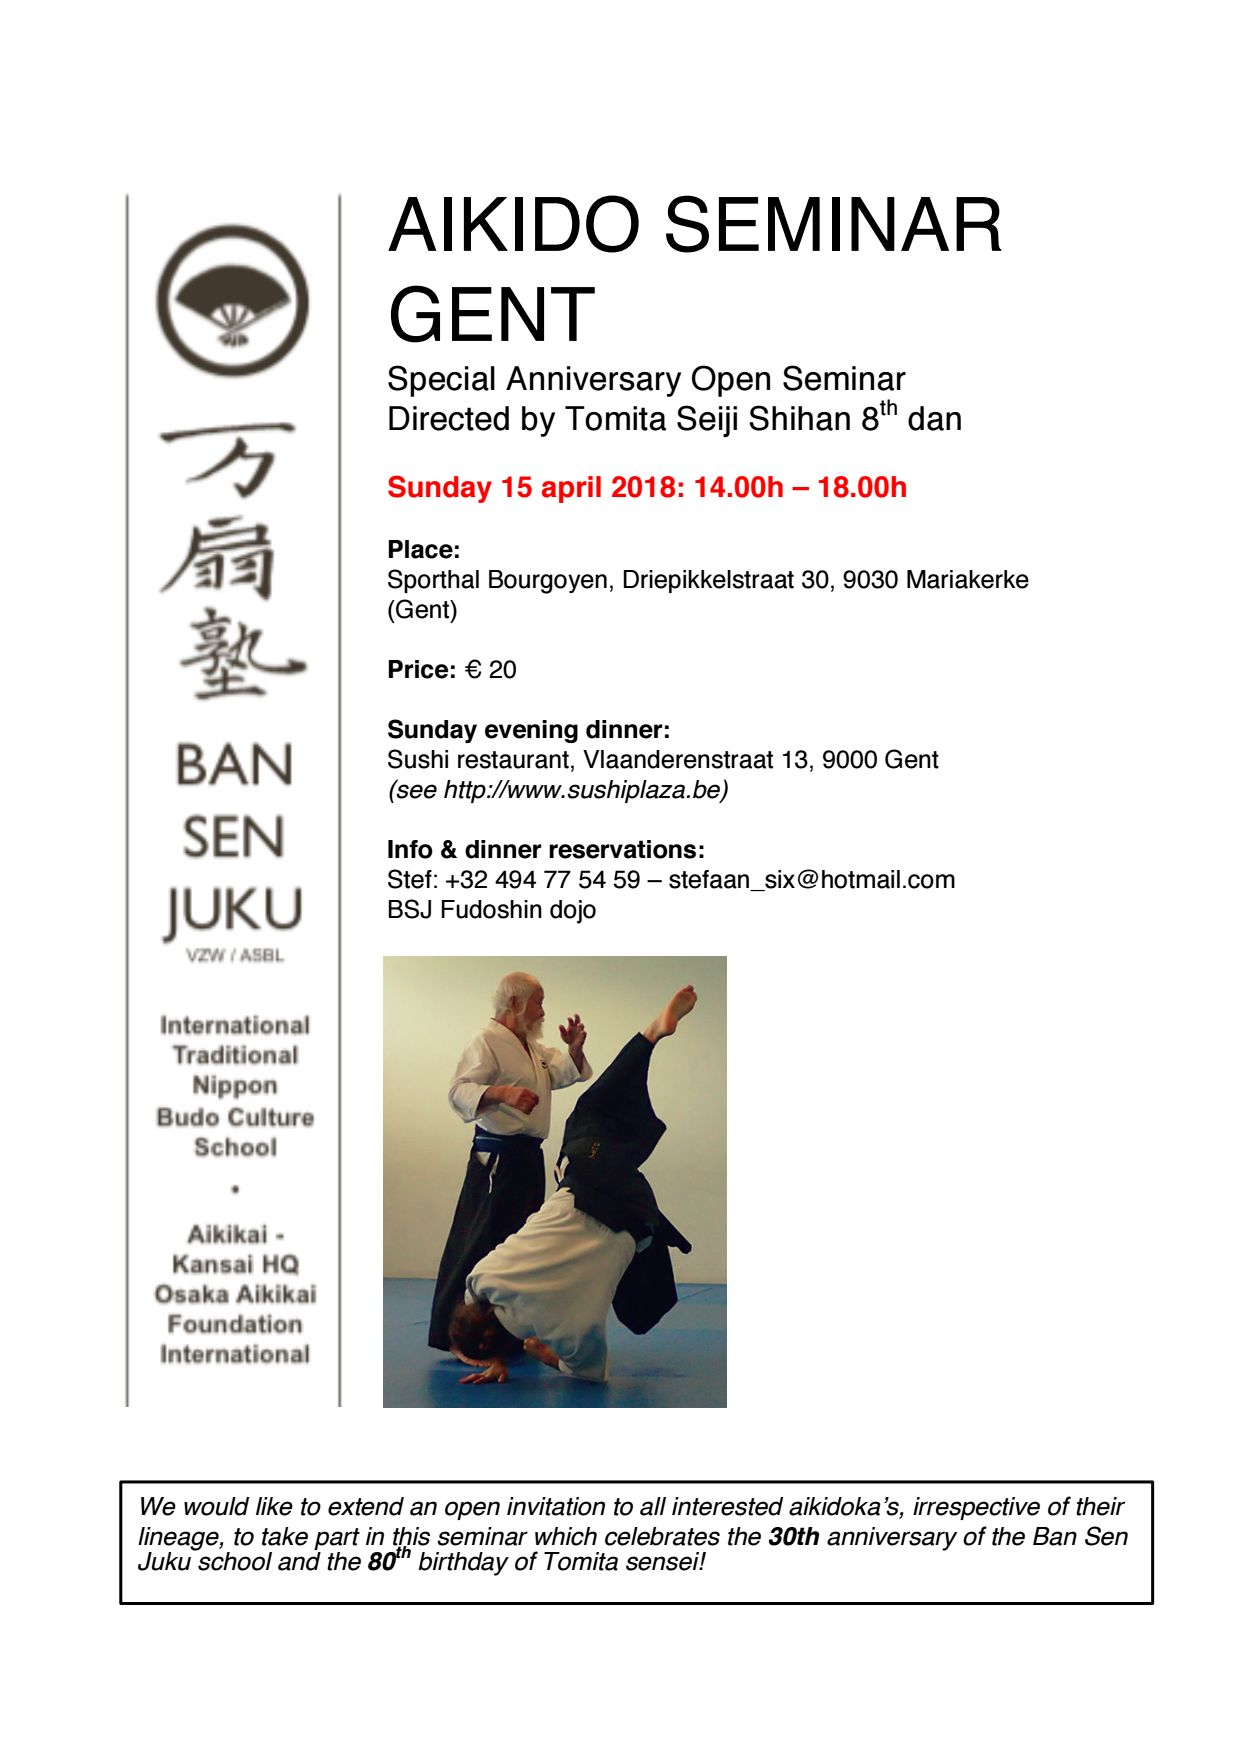 Special Anniversary Open Seminar